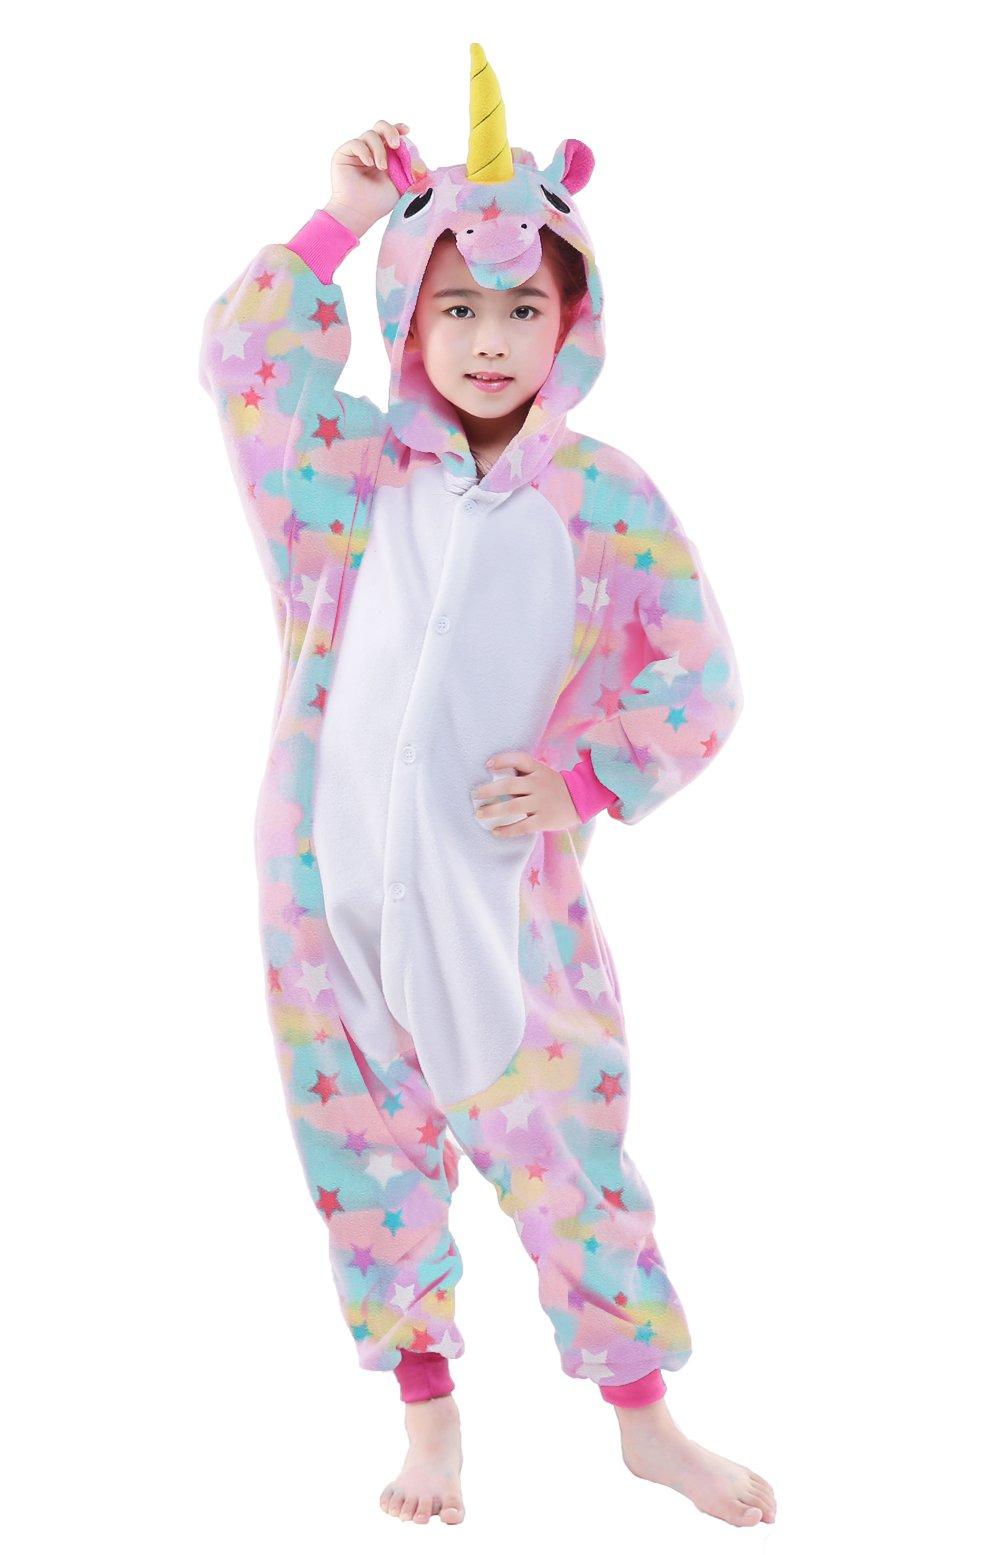 NEWCOSPLAY Cartoon Christmas Costumes Unisex Kids Unicorn Pajamas Gifts (115, color unicorn) by NEWCOSPLAY (Image #6)